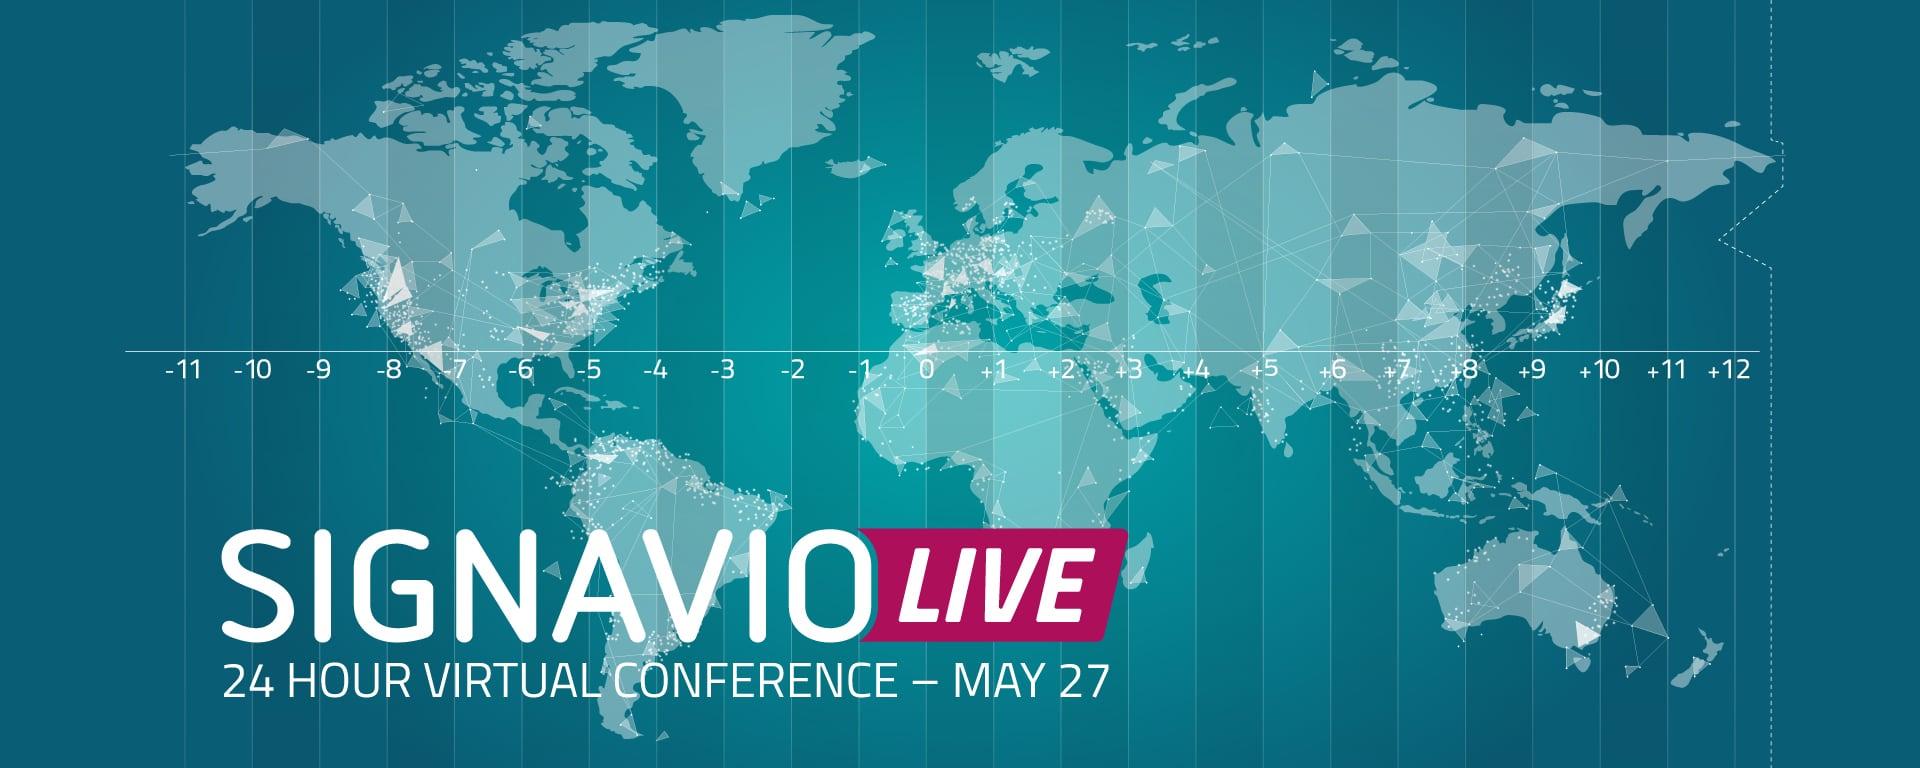 Signavio Live 2020 recap blog header image